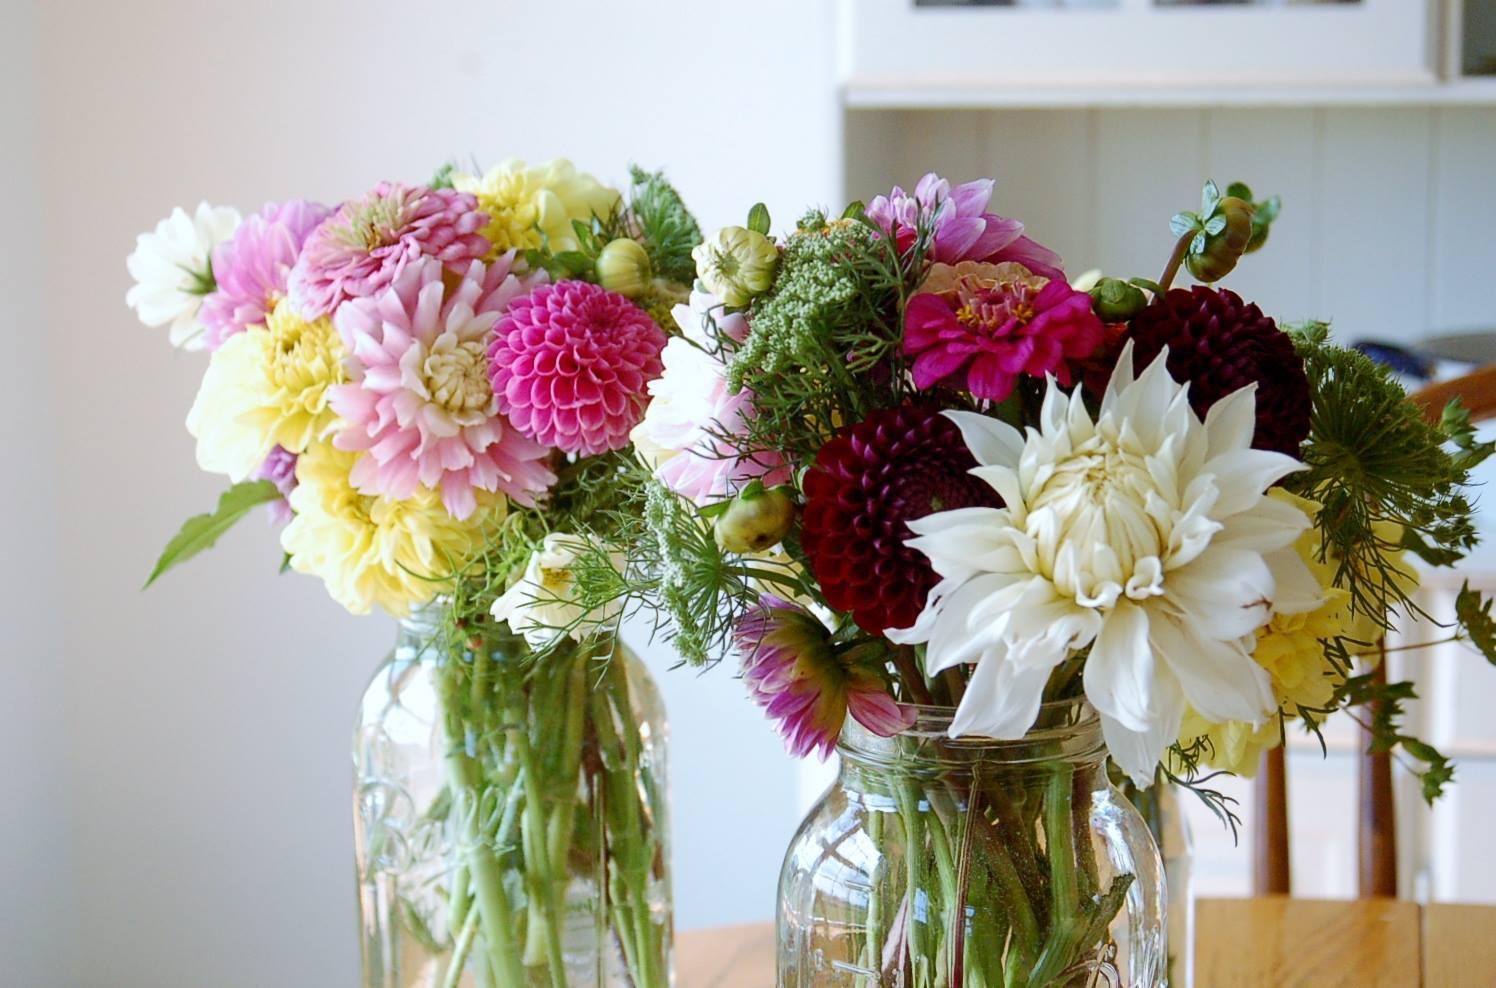 Fairview Farm Flower Subscription